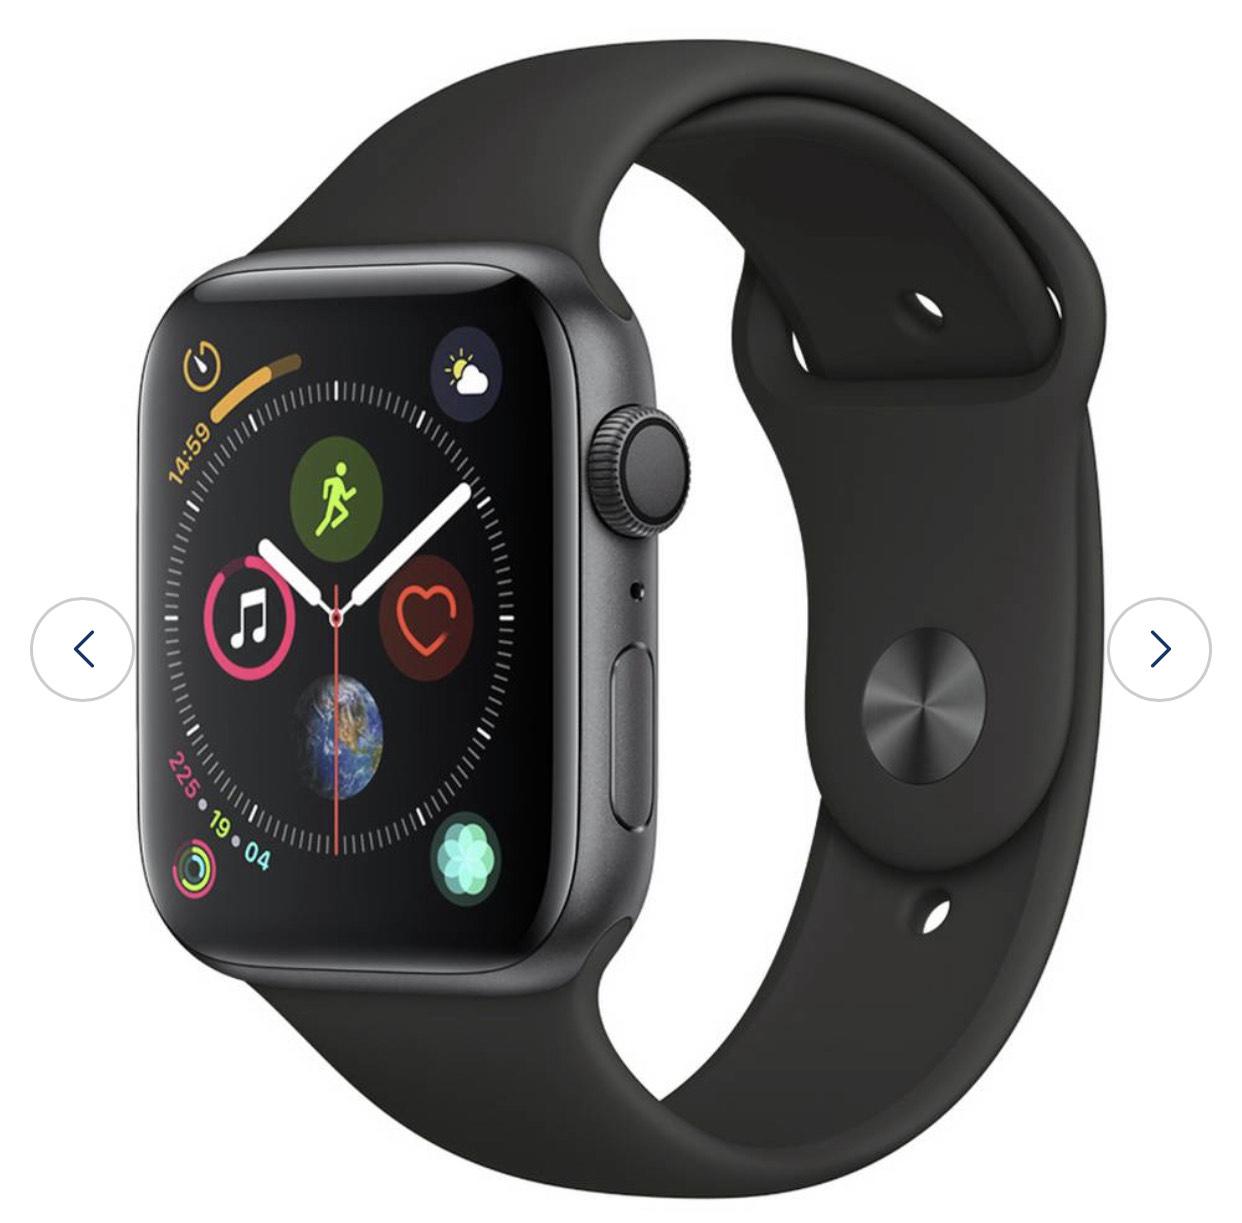 Apple Watch S4 GPS 44mm - Space Grey Aluminum / Silver Aluminium / Gold Aluminium (GPS Only) - £299 @ Argos